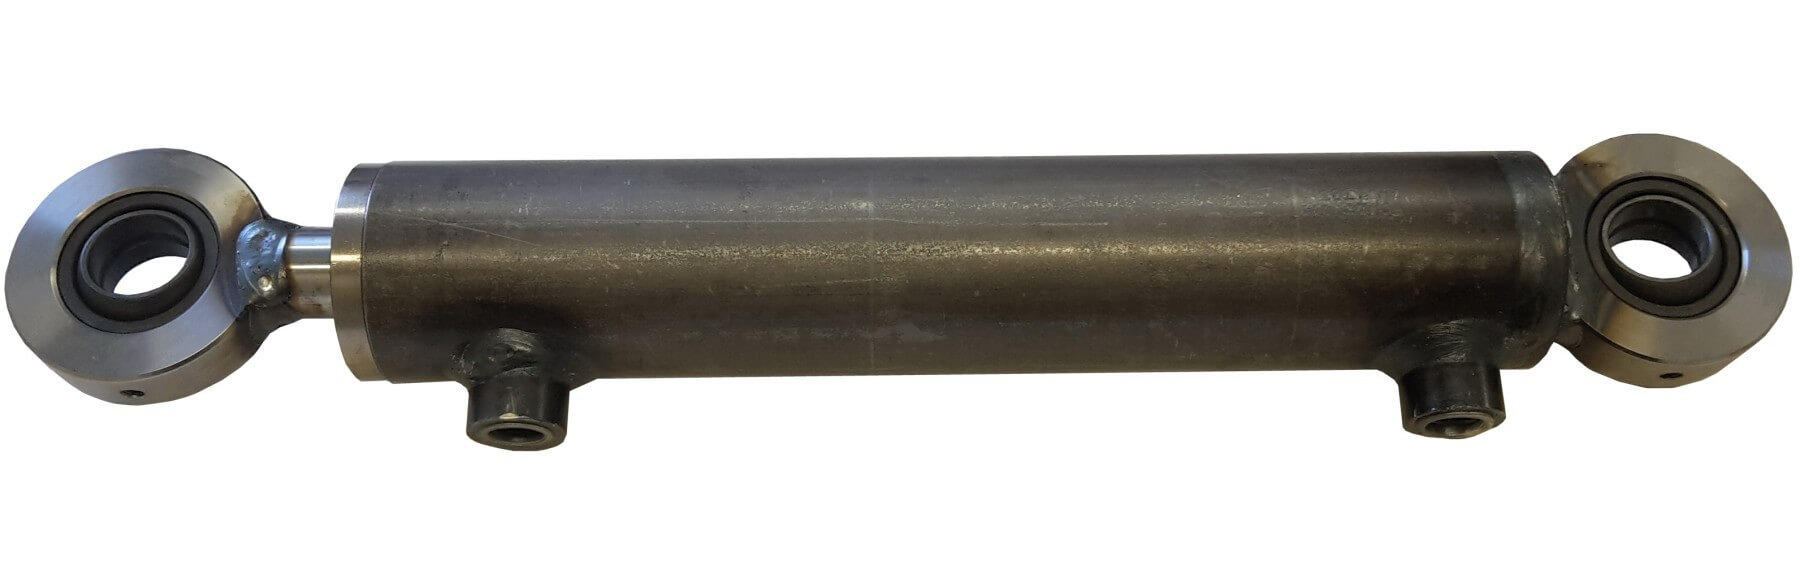 Hydraulisylinteri CL 50. 25. 600 GE